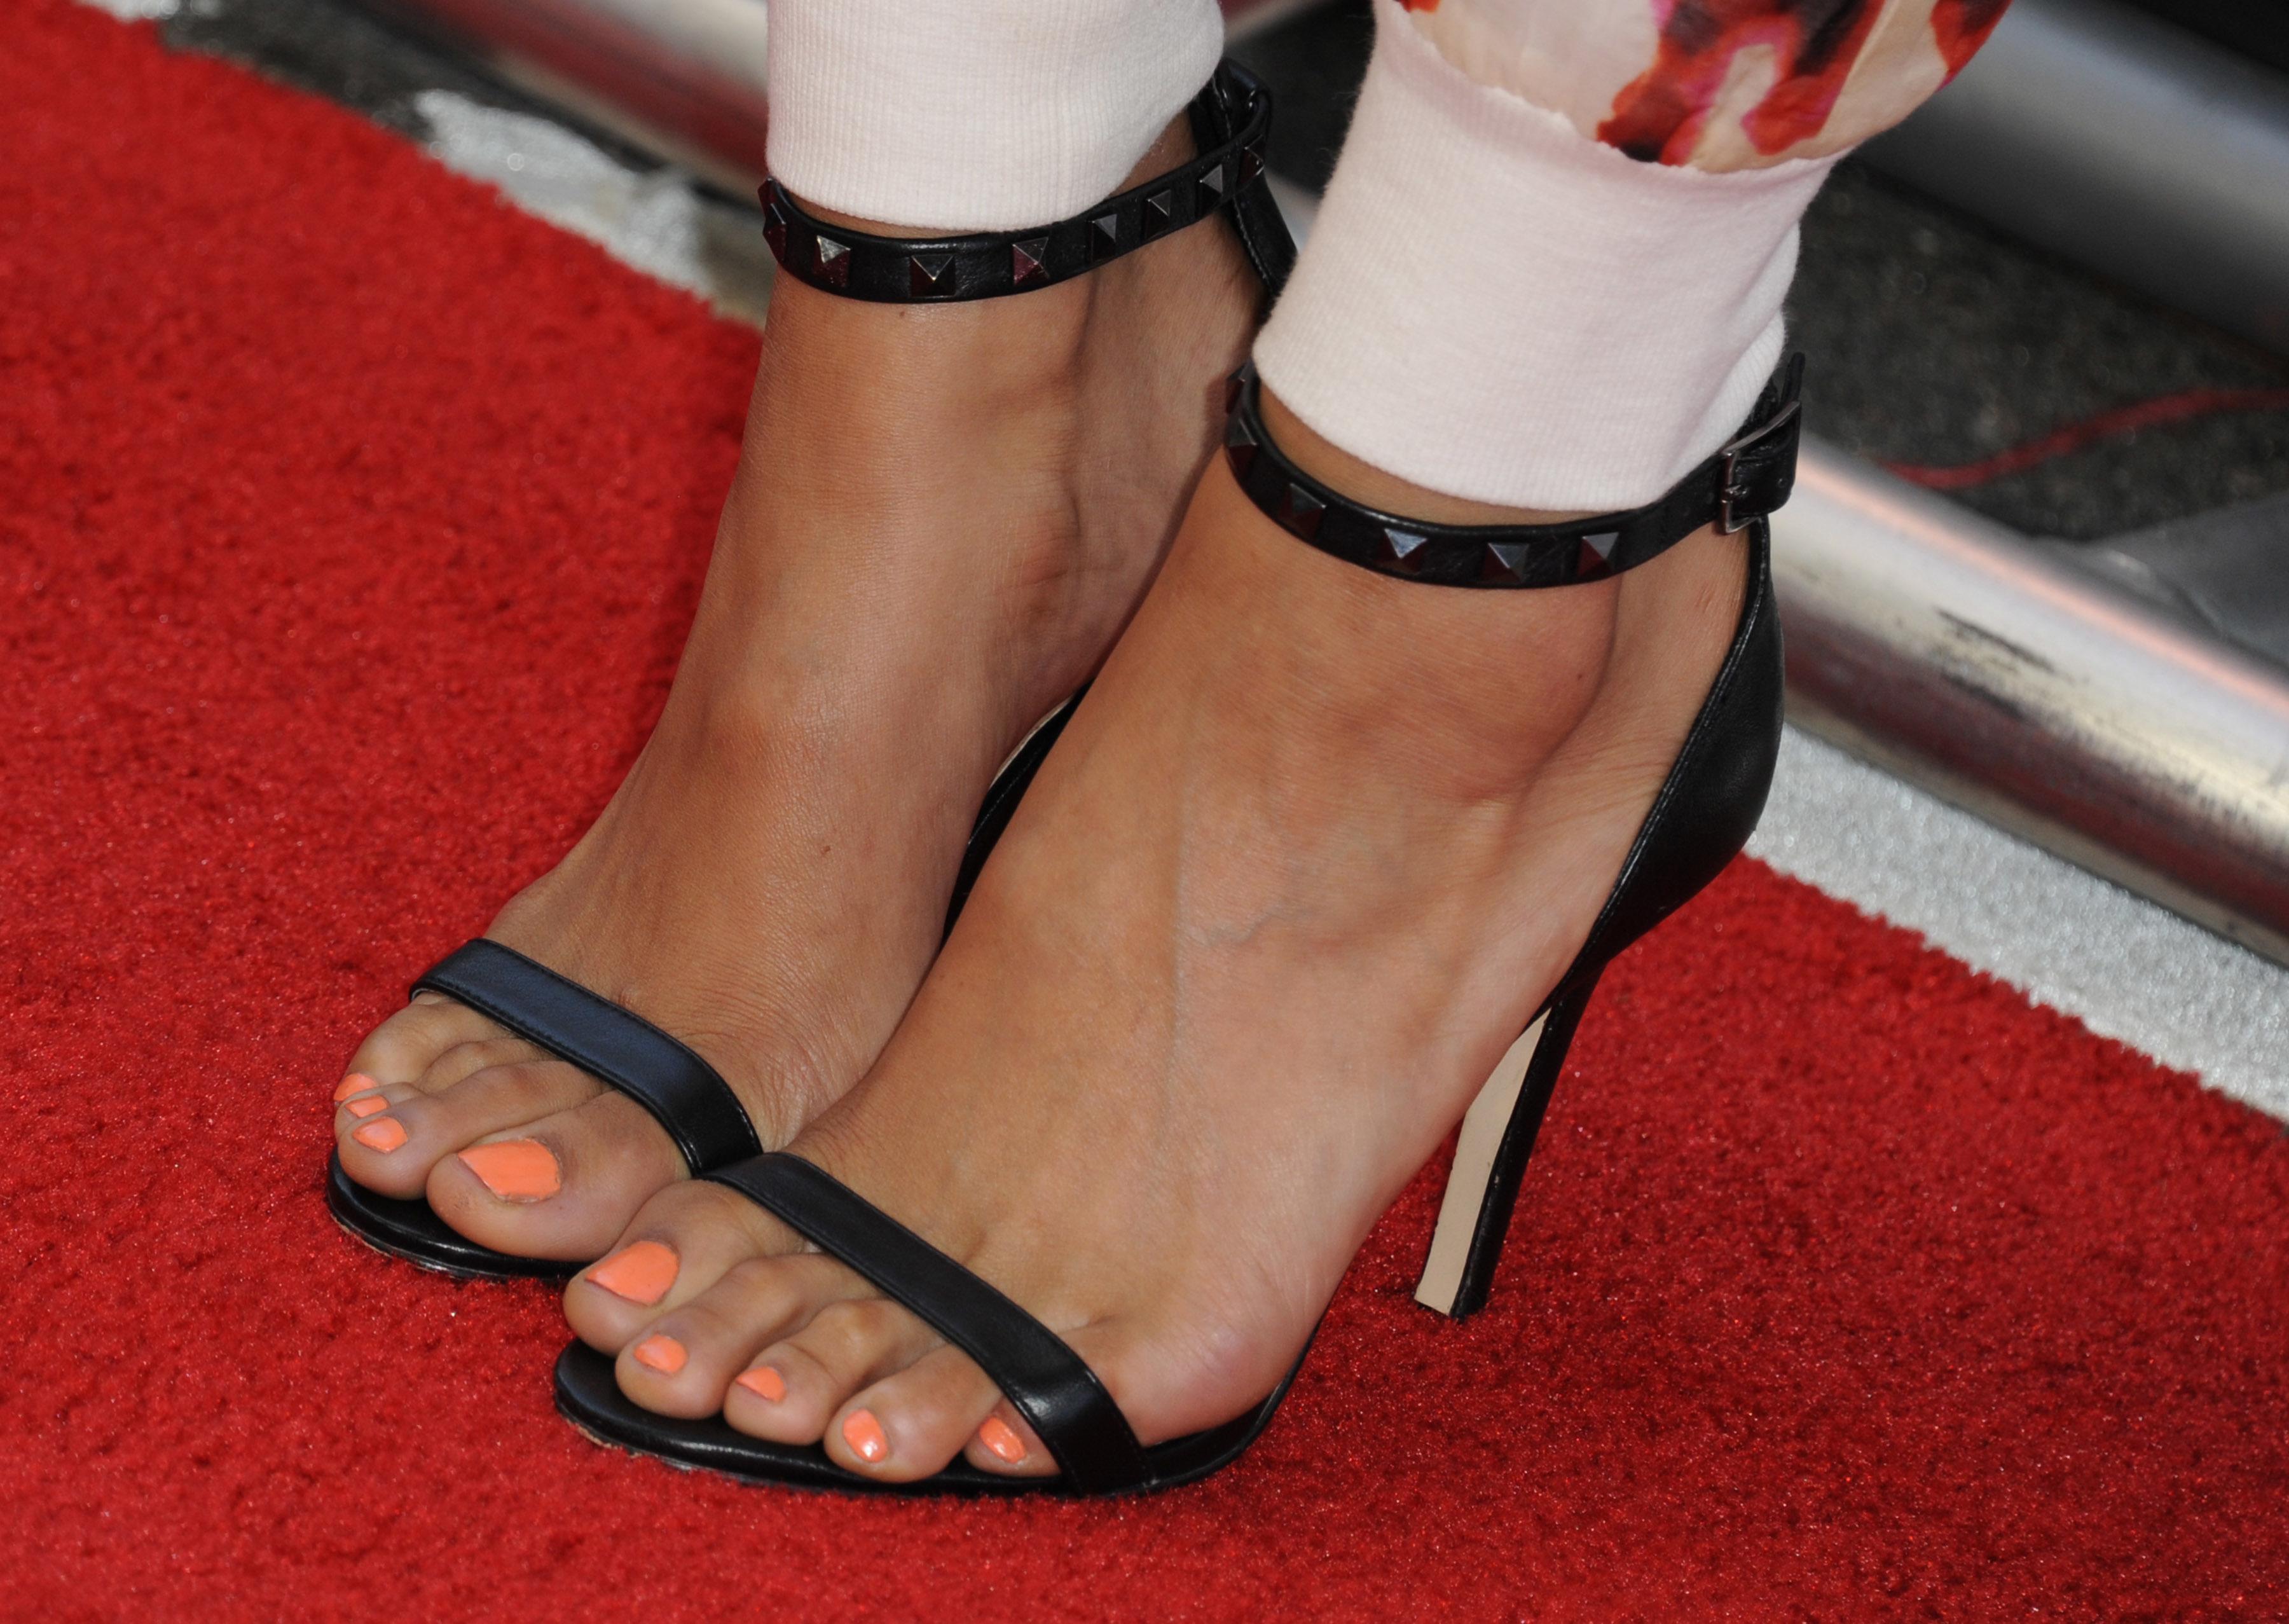 Feet Seleziya Sparx nudes (98 photos), Sexy, Paparazzi, Twitter, bra 2017